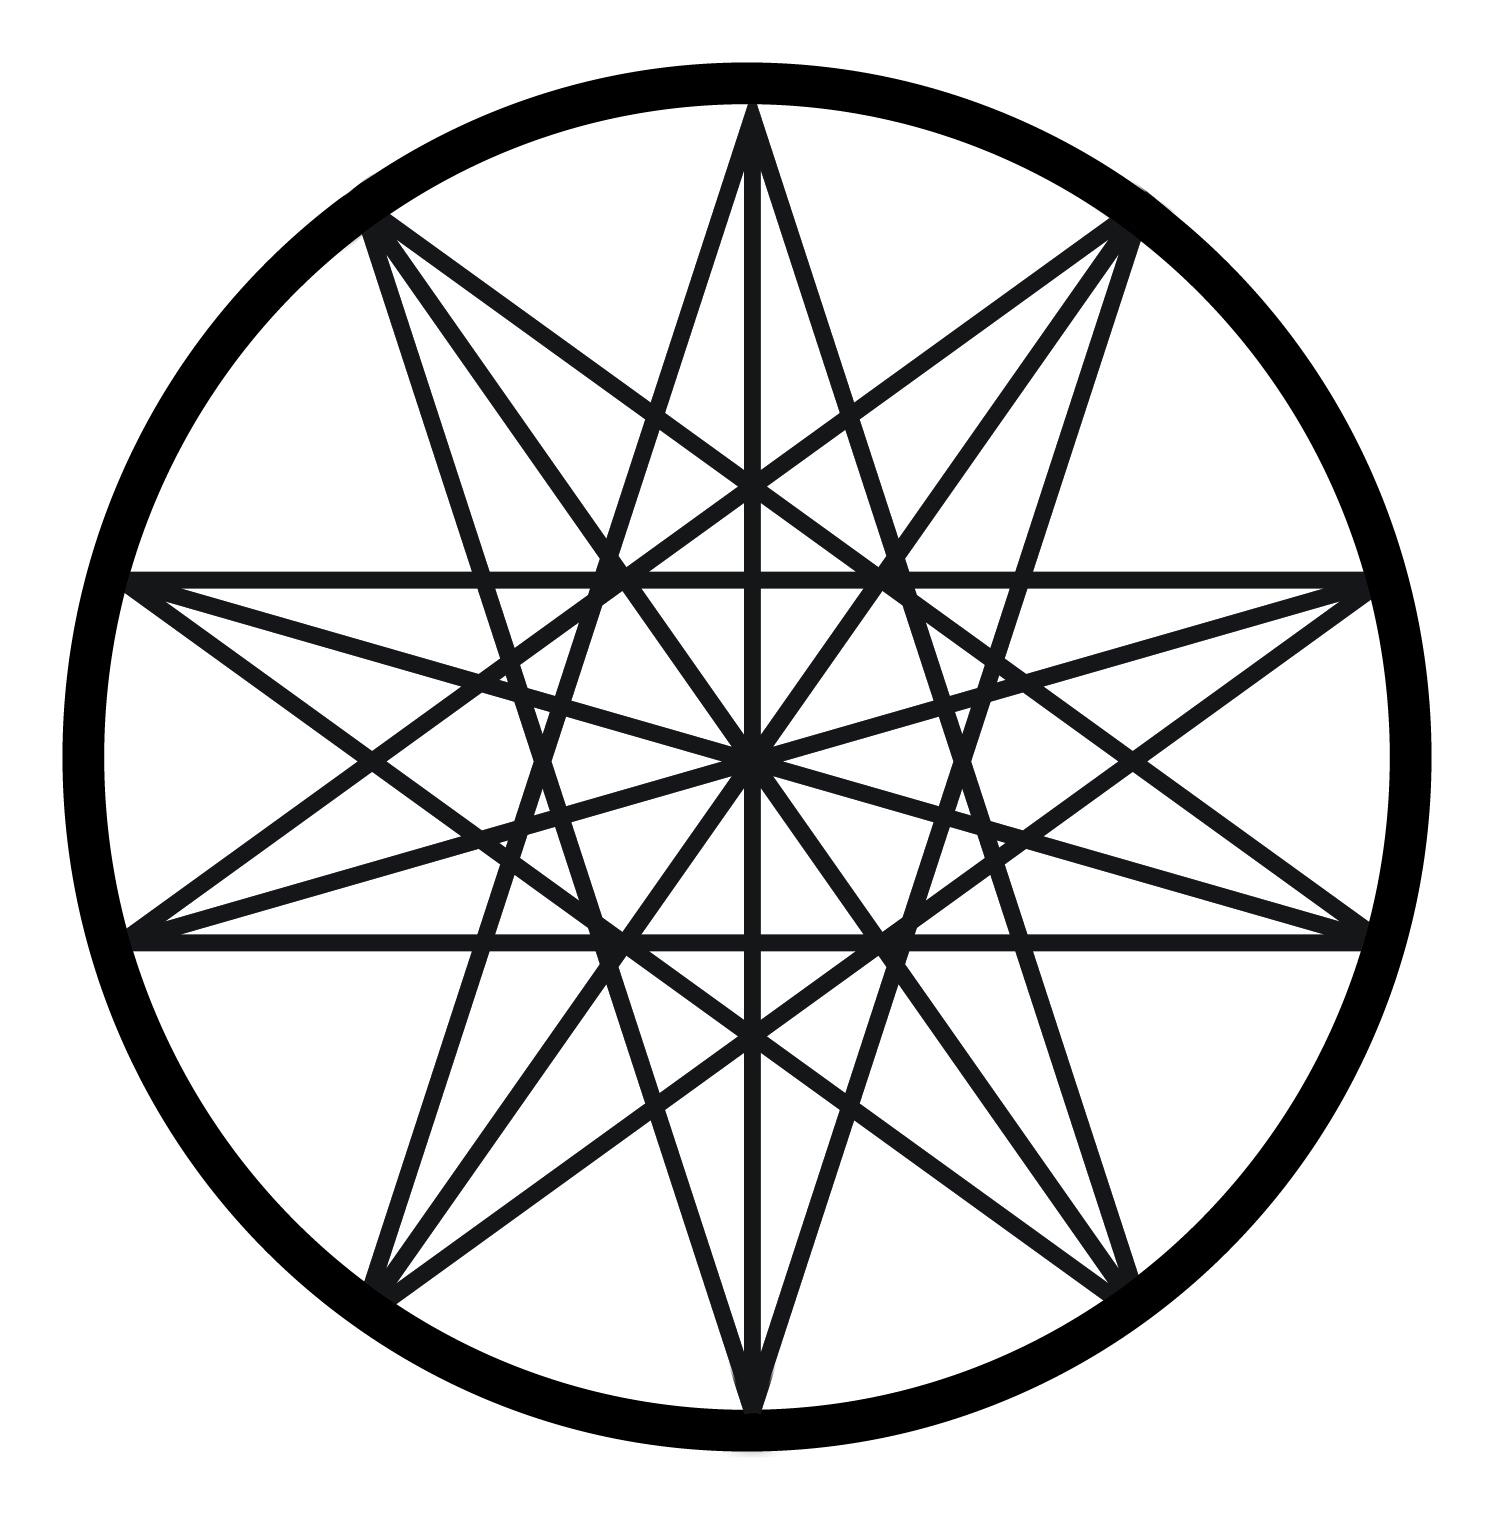 Iva kenaz magic symbols enneagram in nonagon buycottarizona Image collections